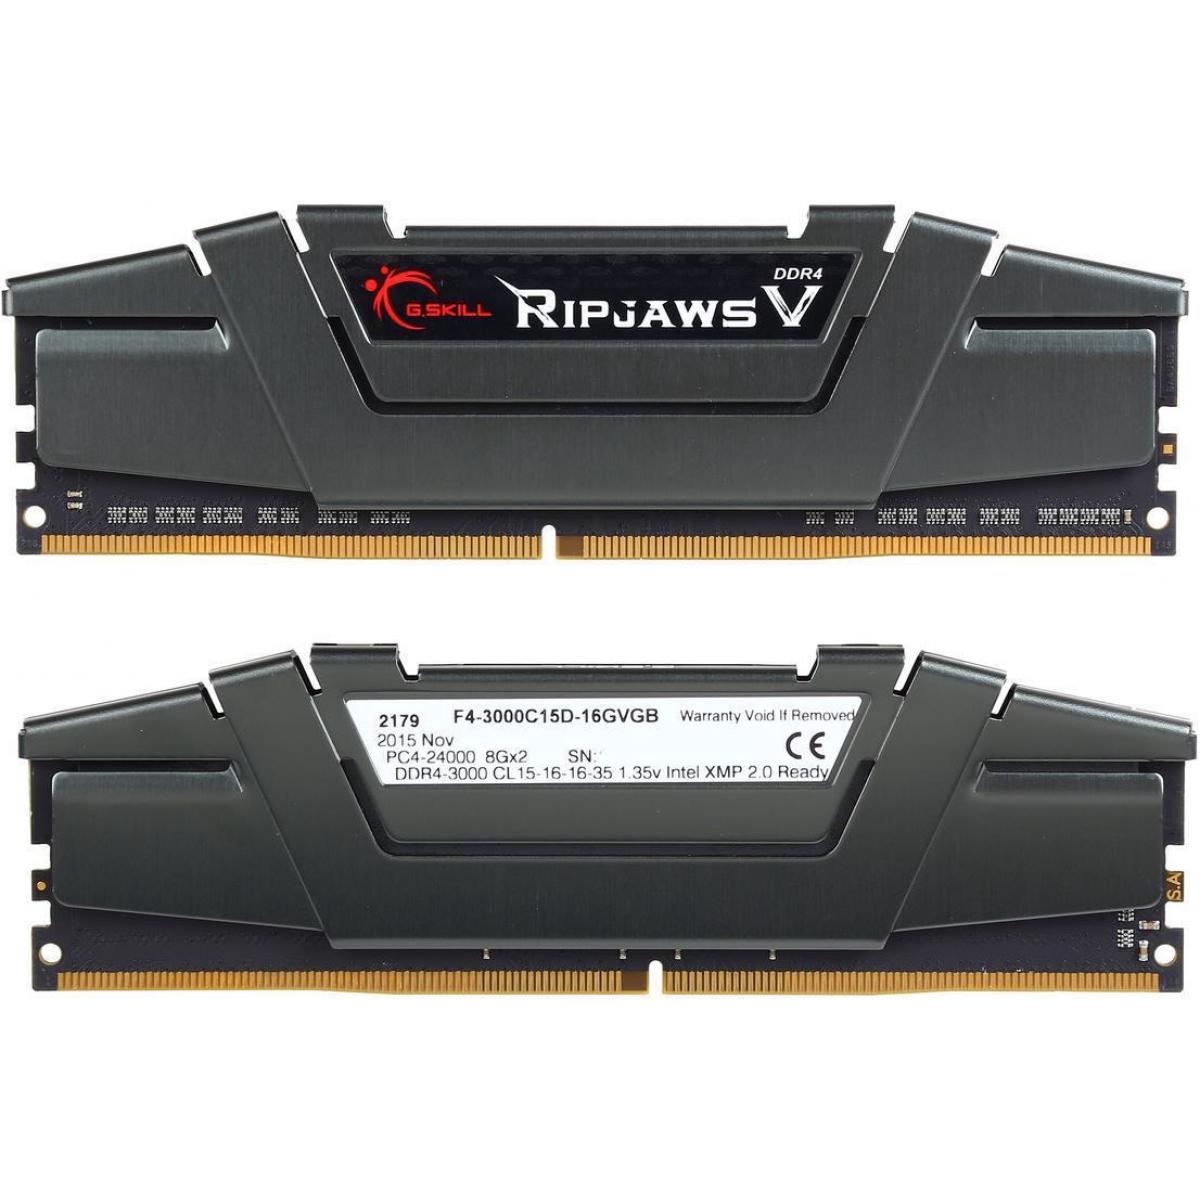 Memória DDR4 G.Skill Ripjaws V, 16GB (2x8GB) 3000MHz, F4-3000C15D-16GVGB